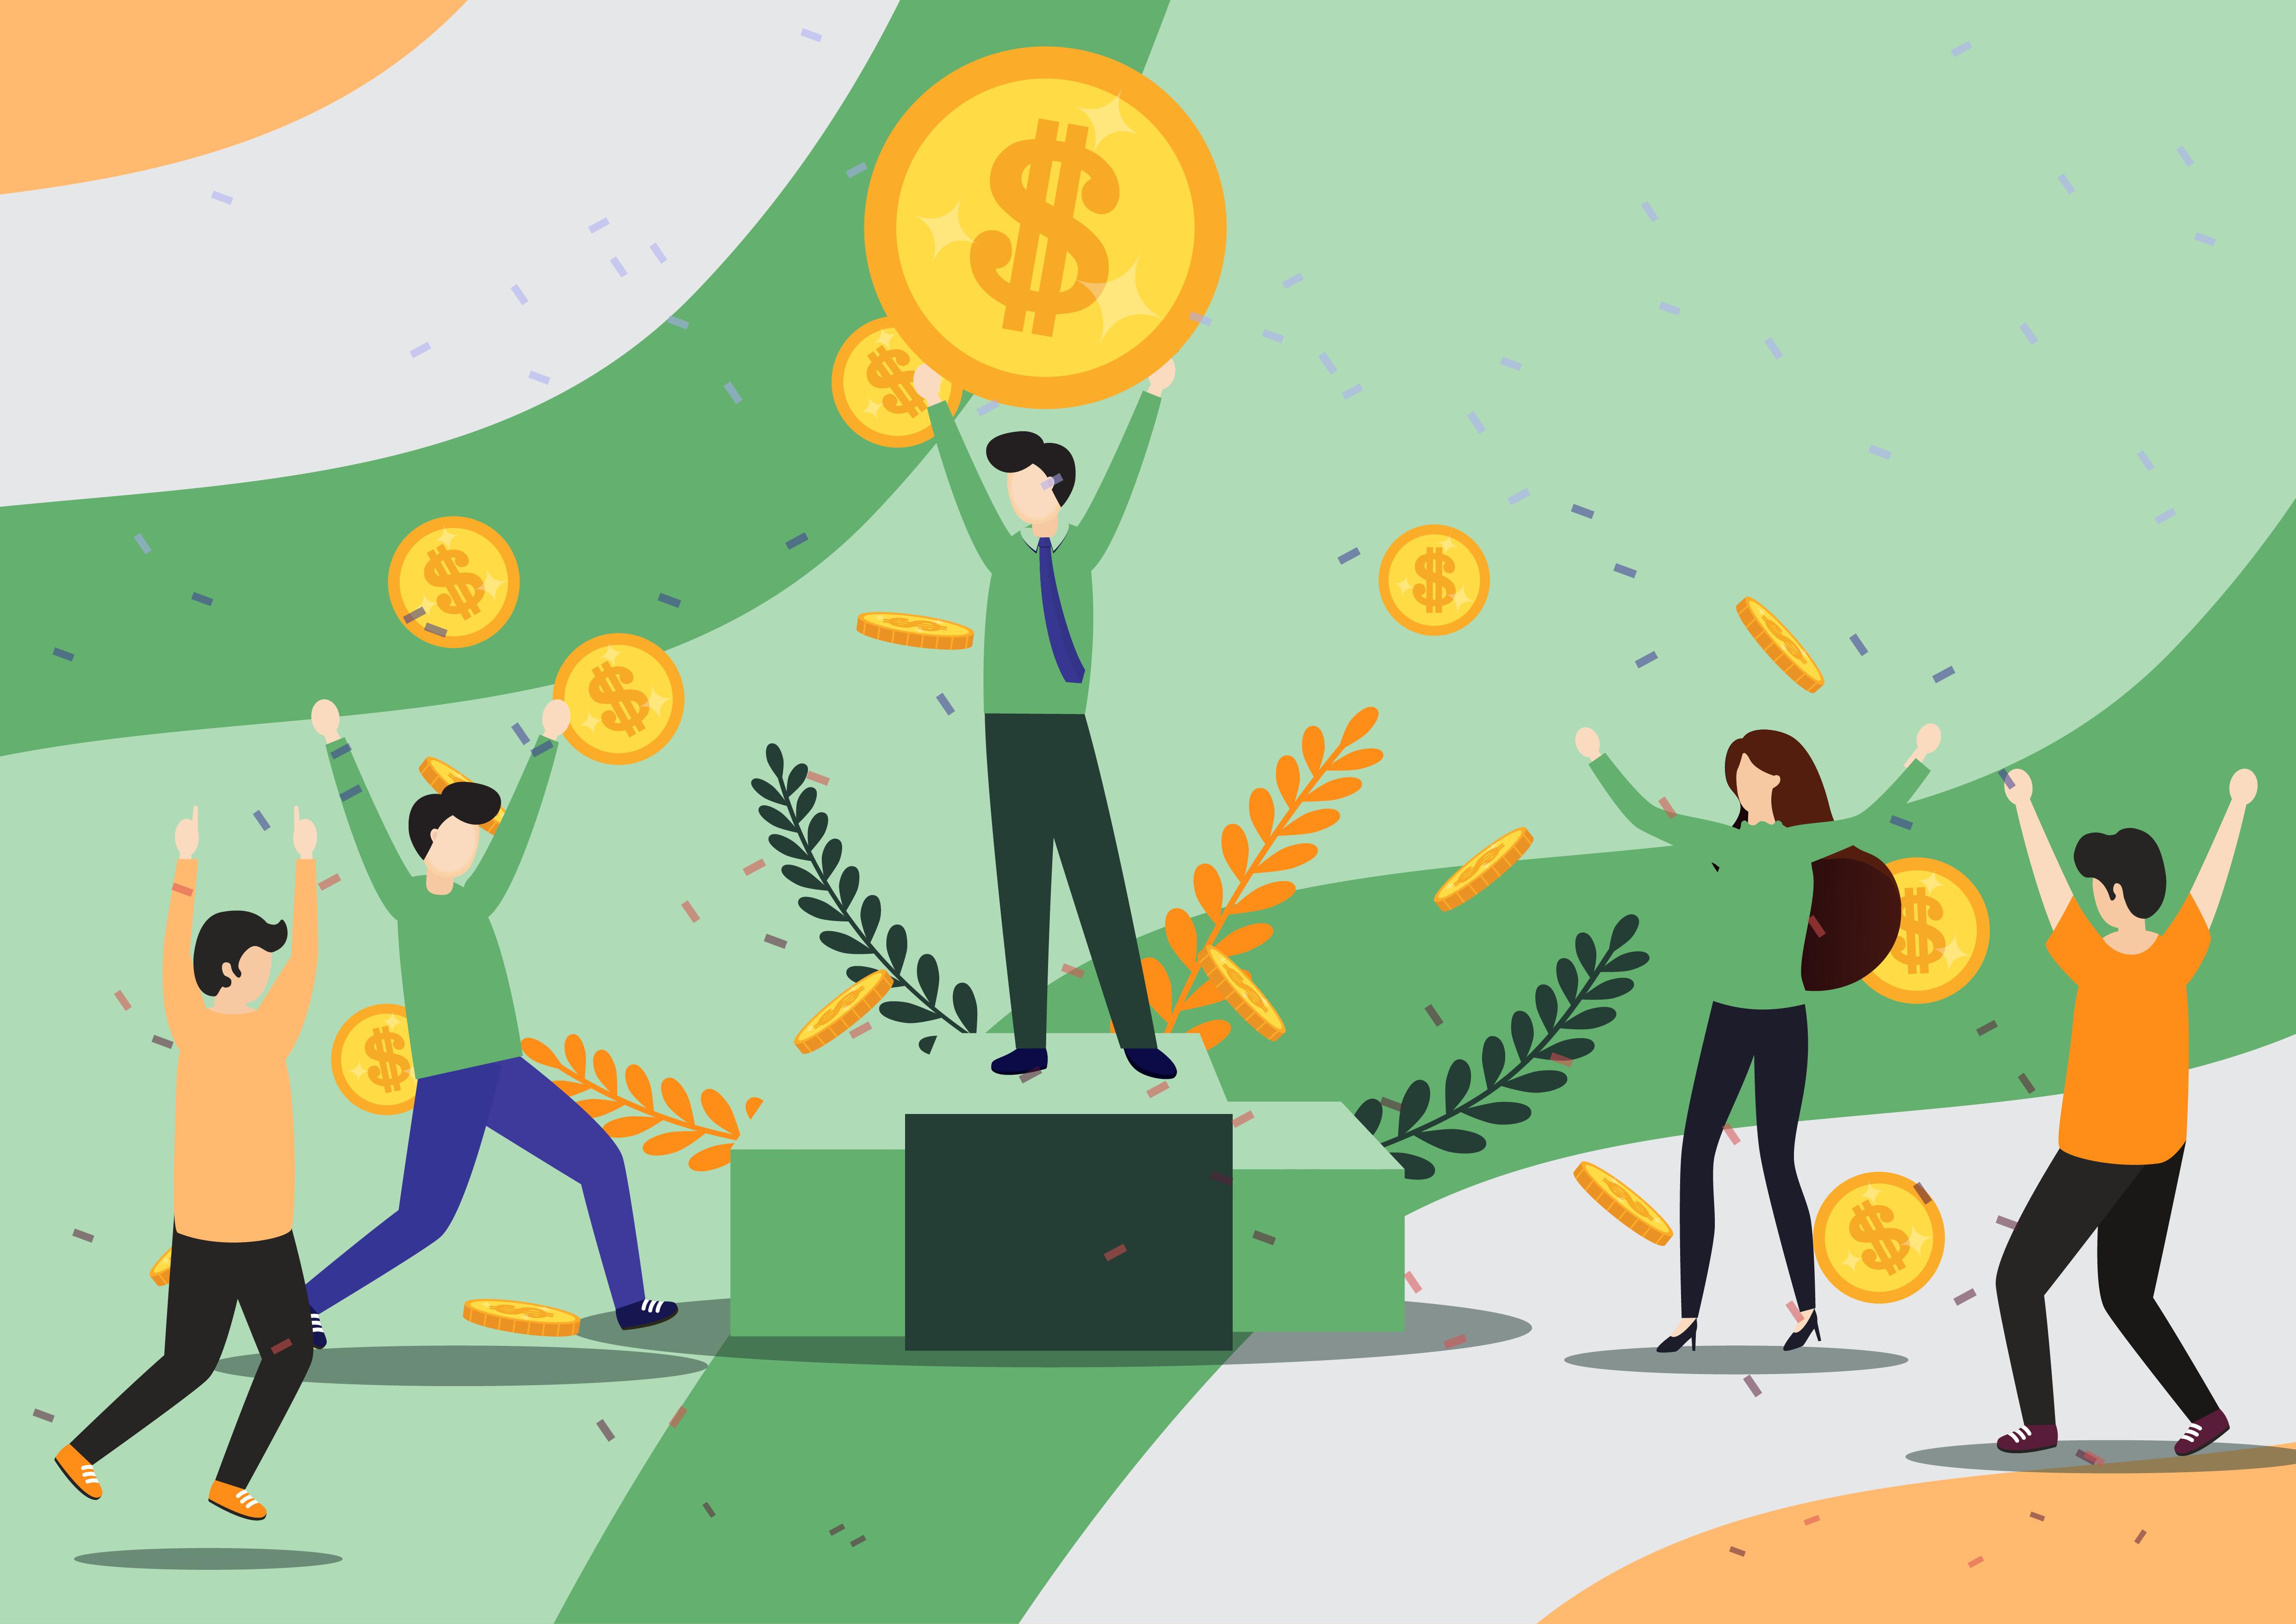 Celebrating Grant Funding Success of Over $2 Million in 2019